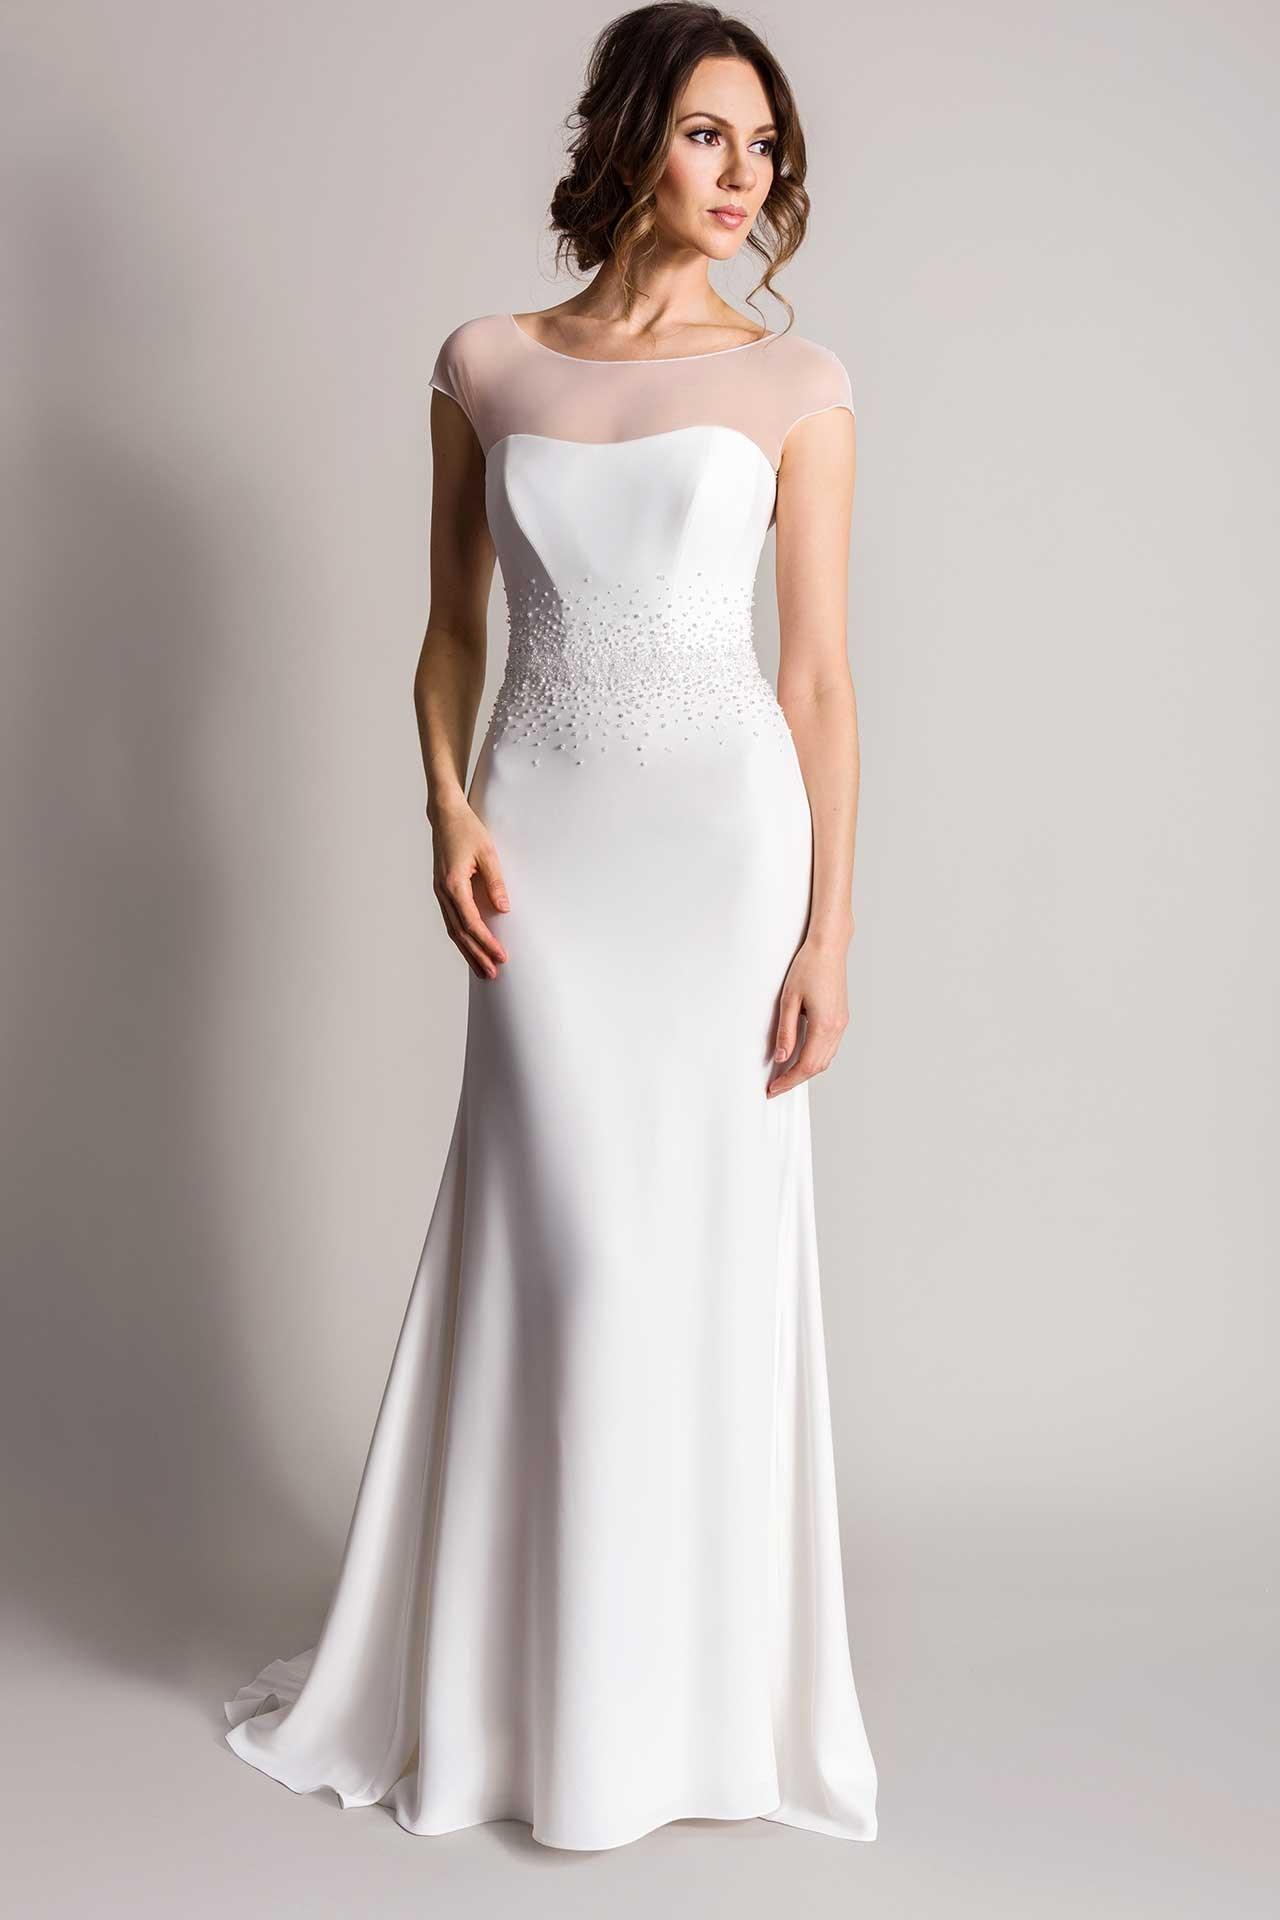 minimalist wedding dresses photo - 1